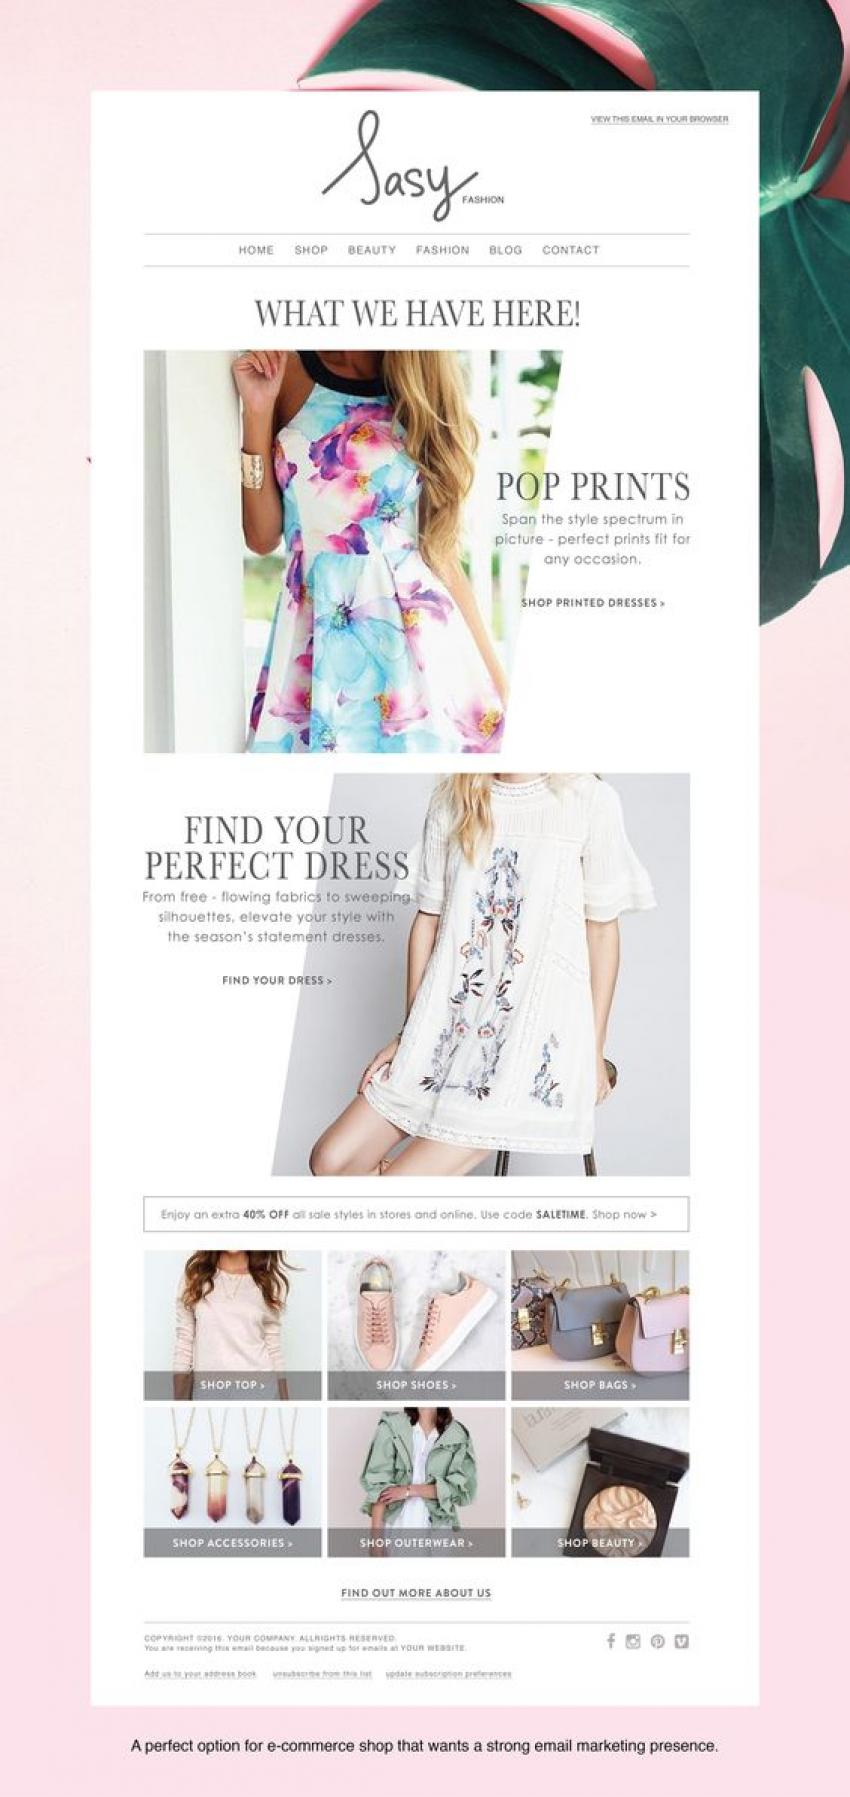 example-sasy-fashion